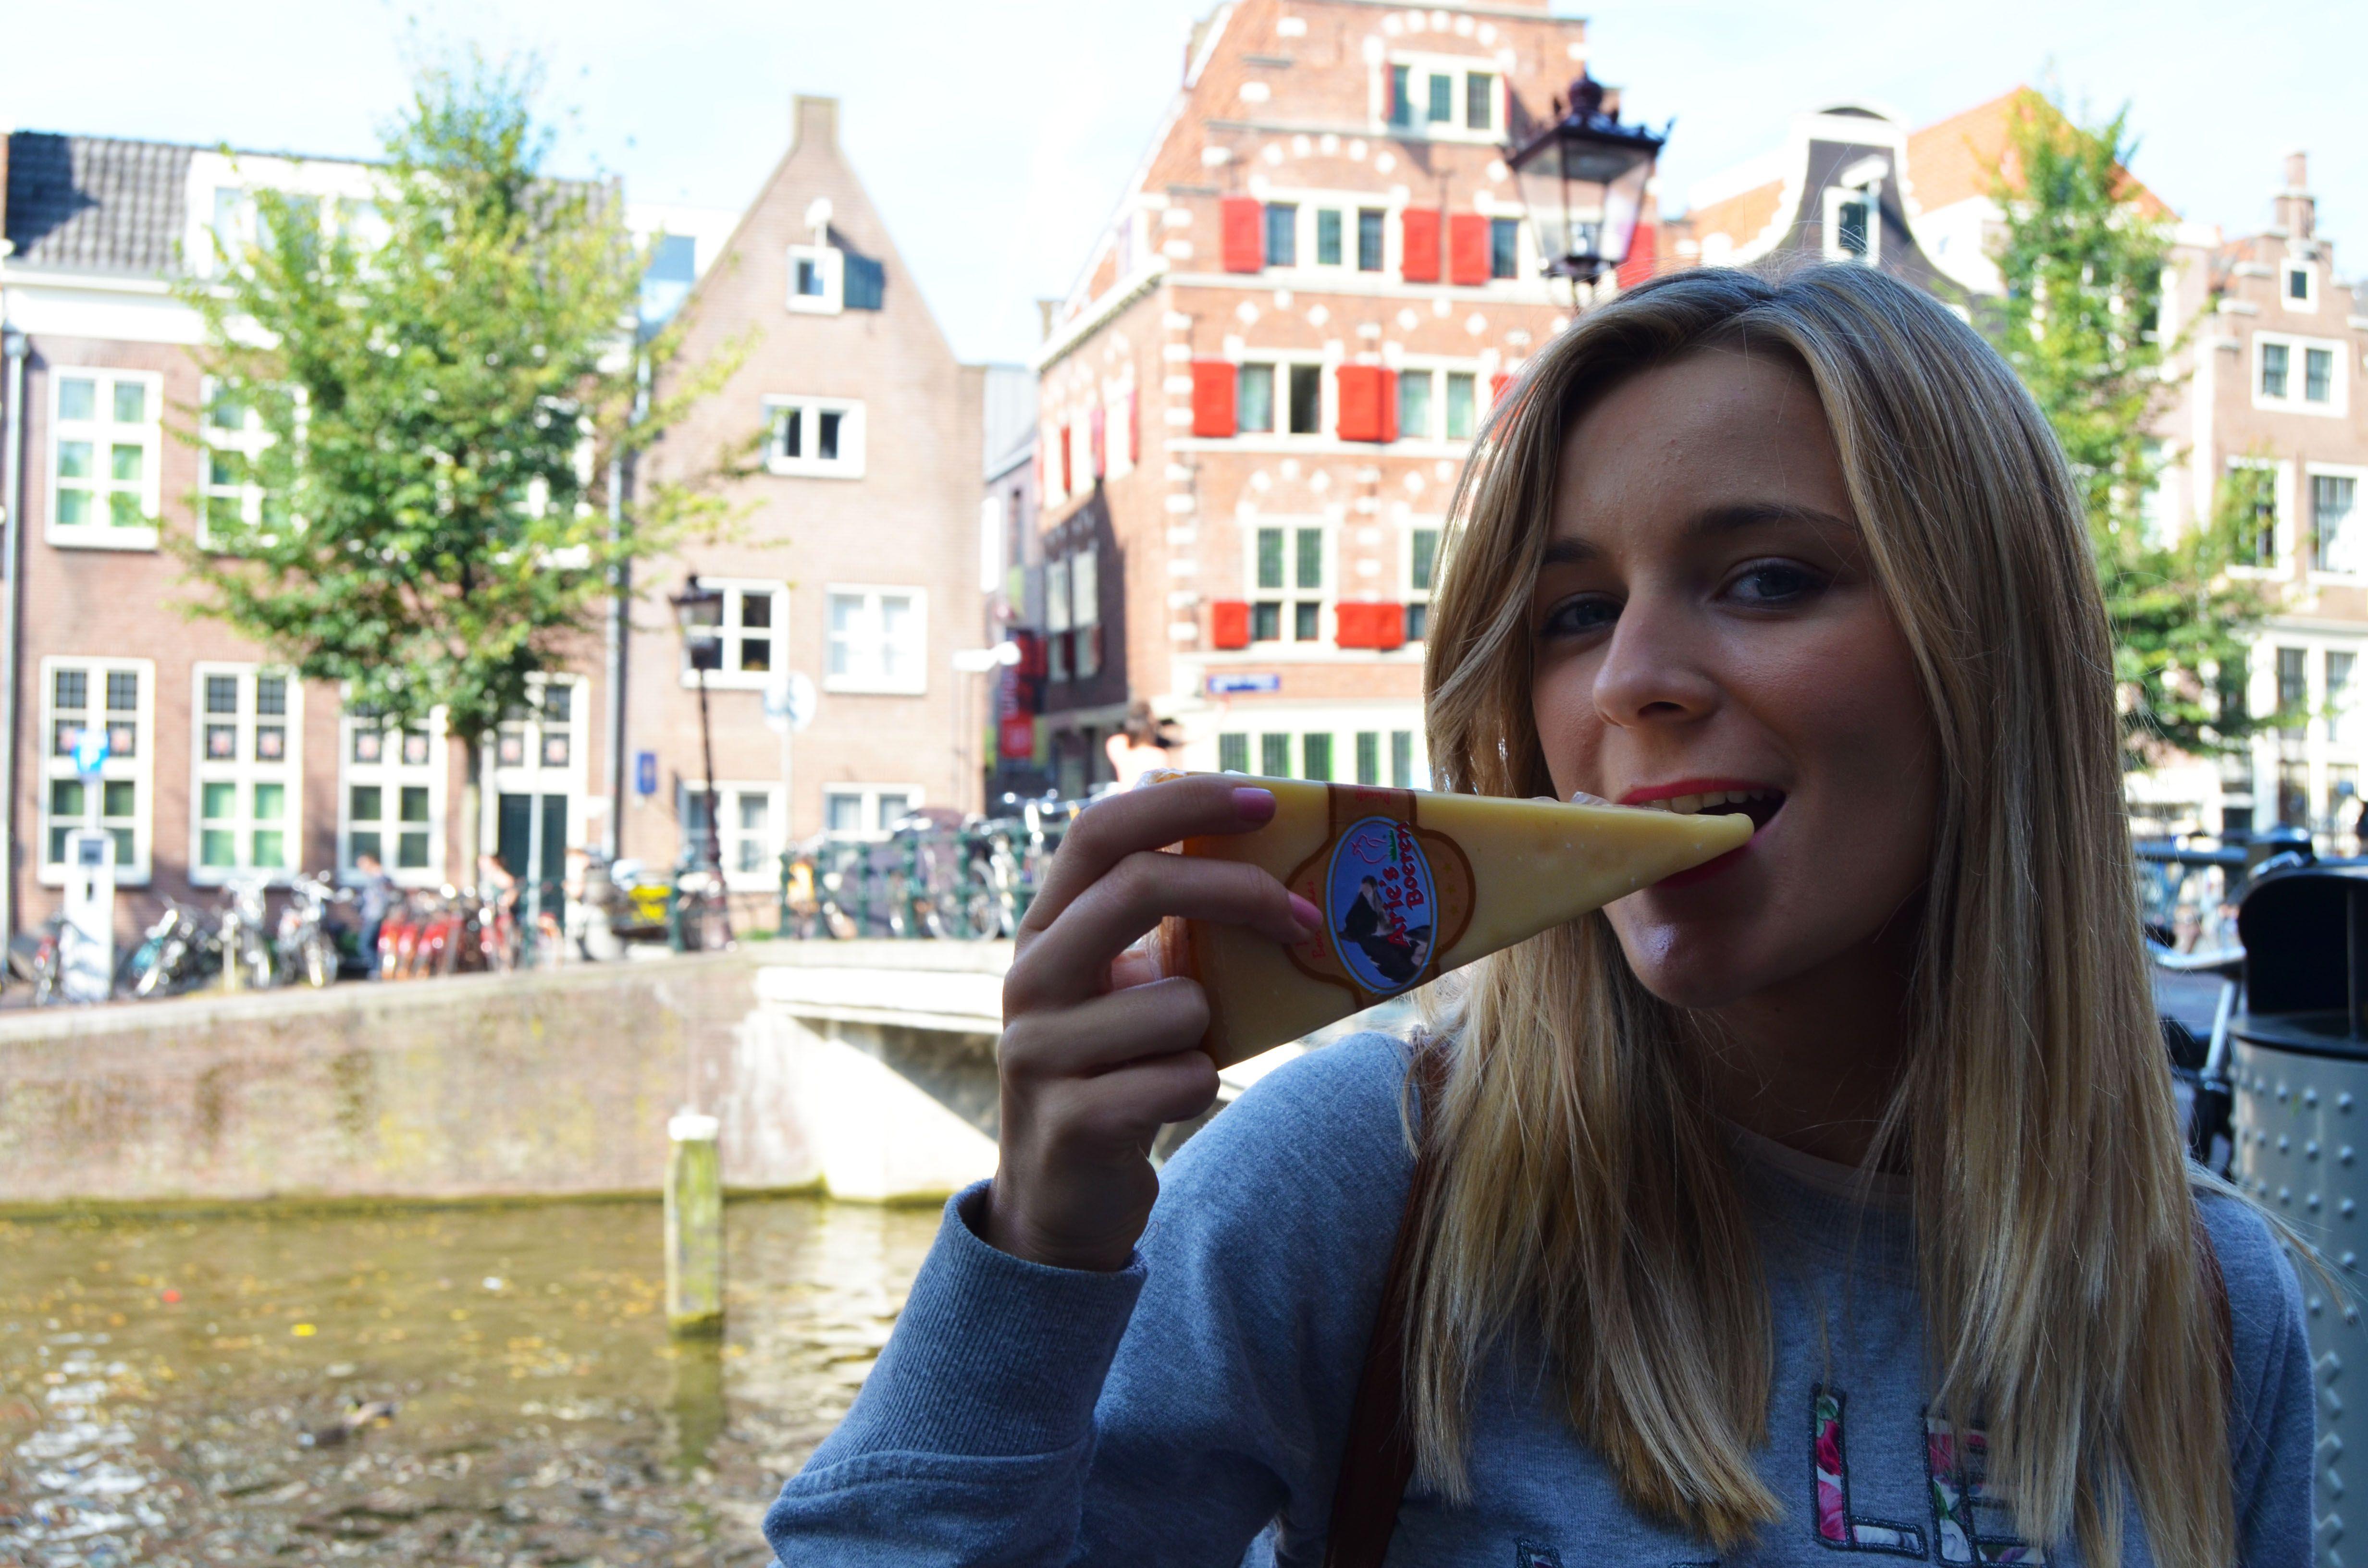 Queso Ámsterdam